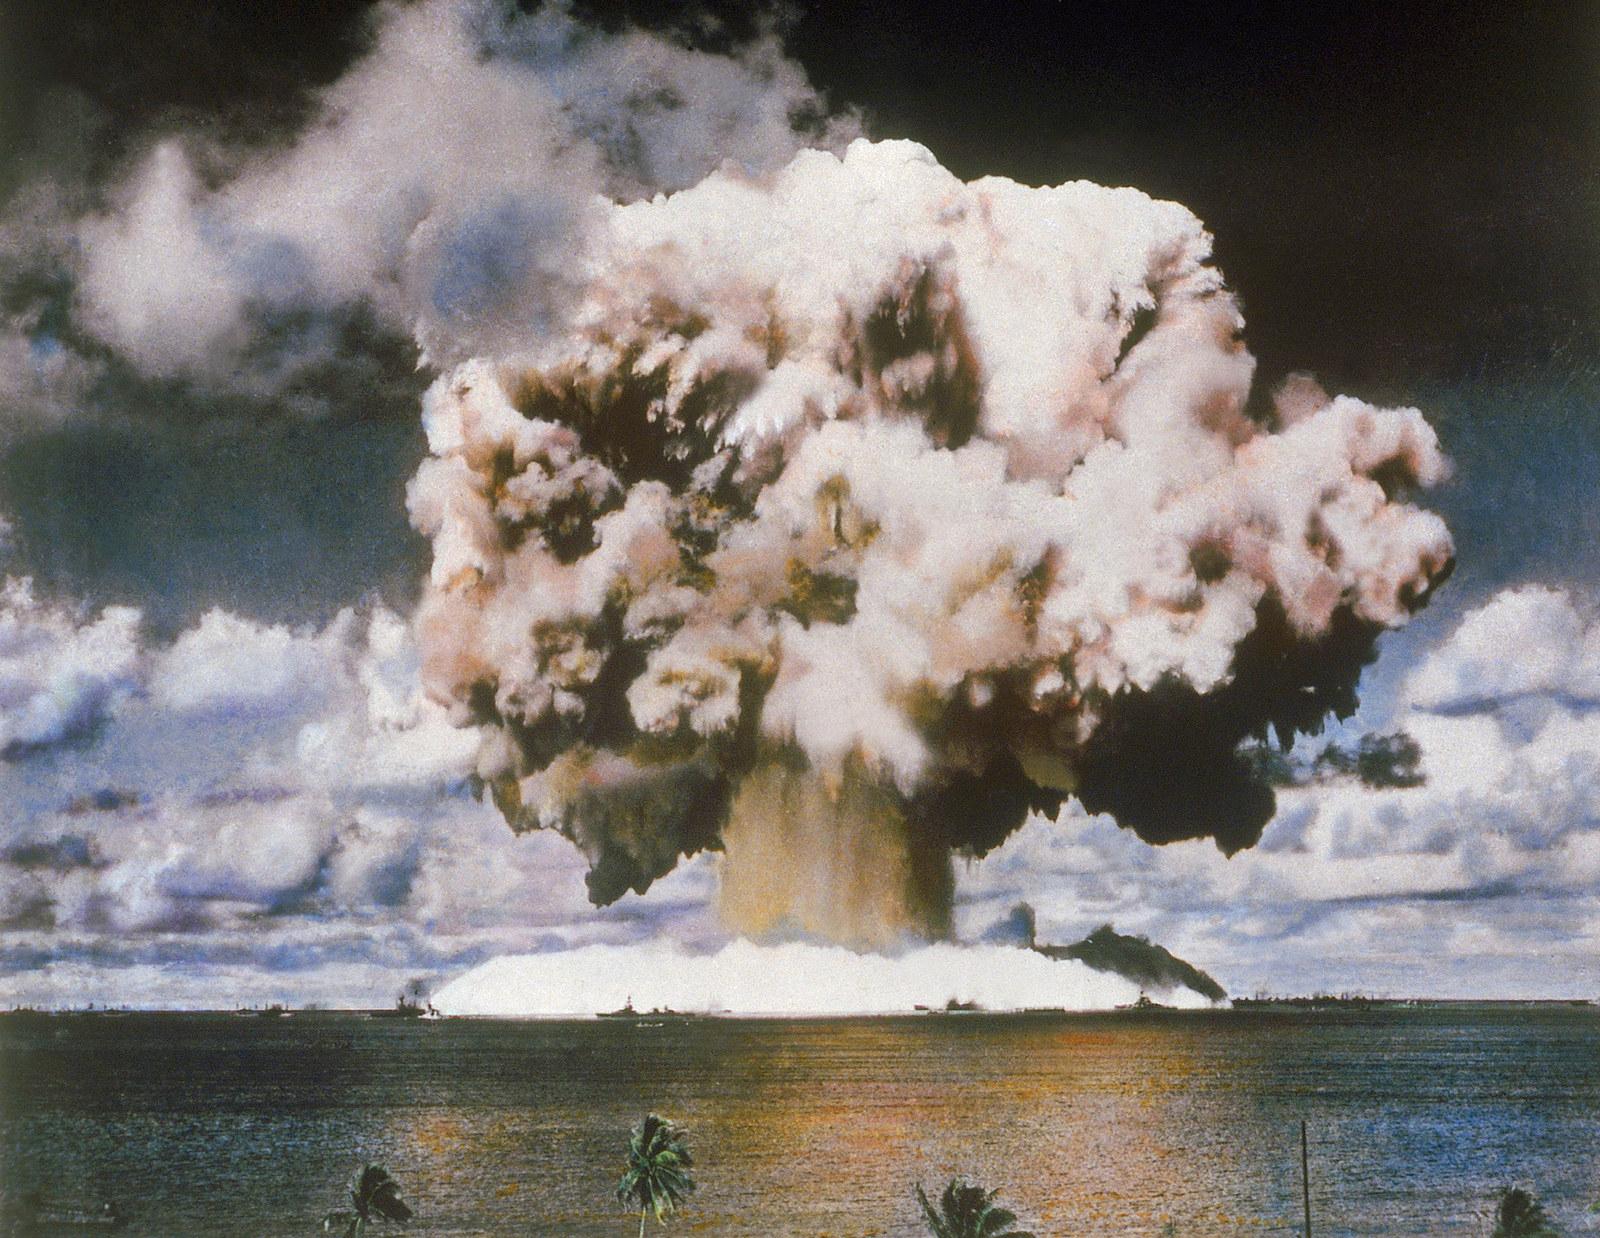 bikini-island-hydrogen-bomb-watch-porn